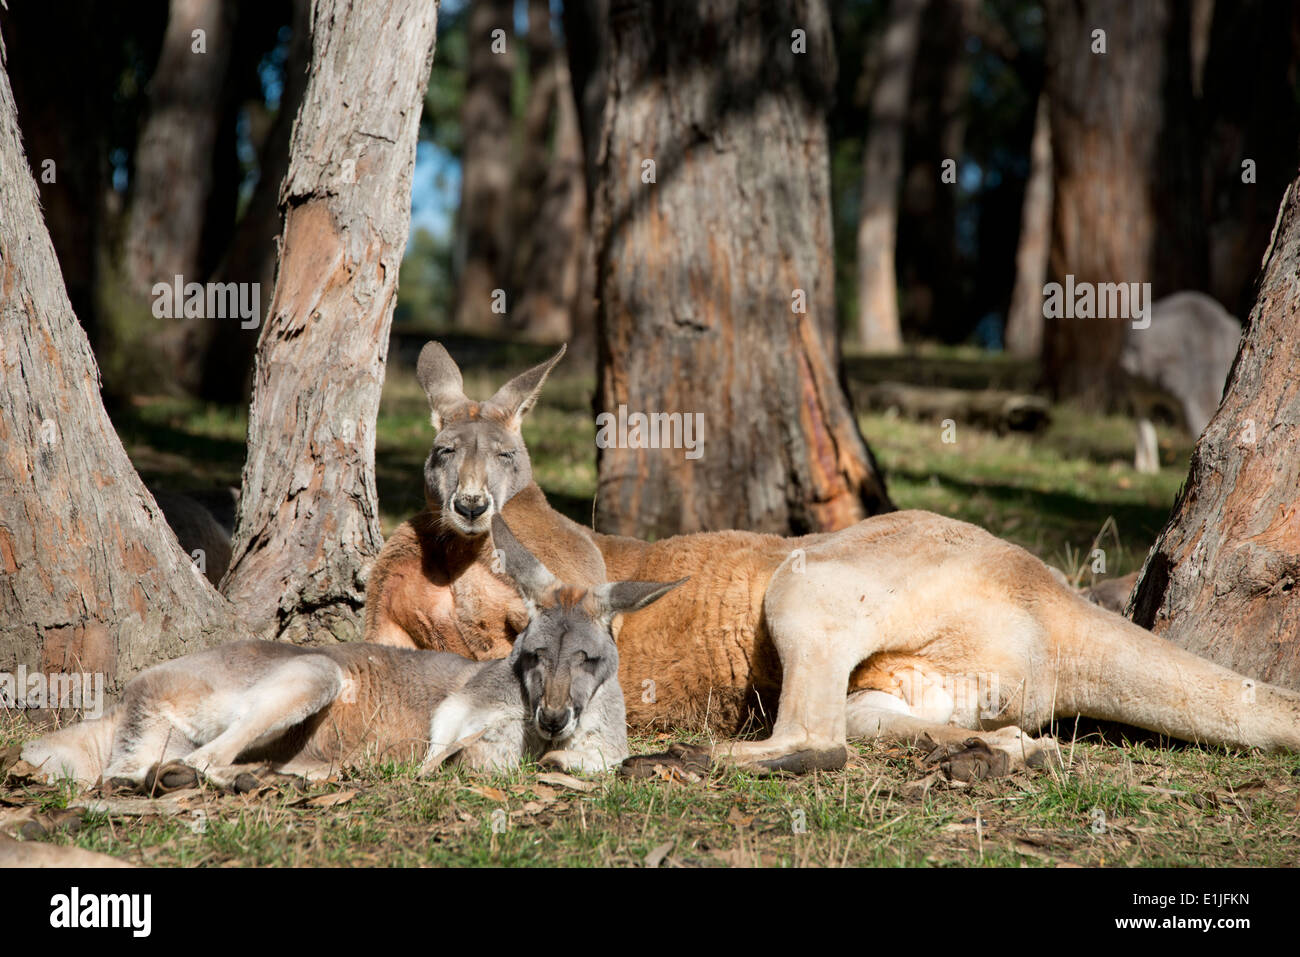 Australia South Australia Adelaide Cleland Wildlife Park Red